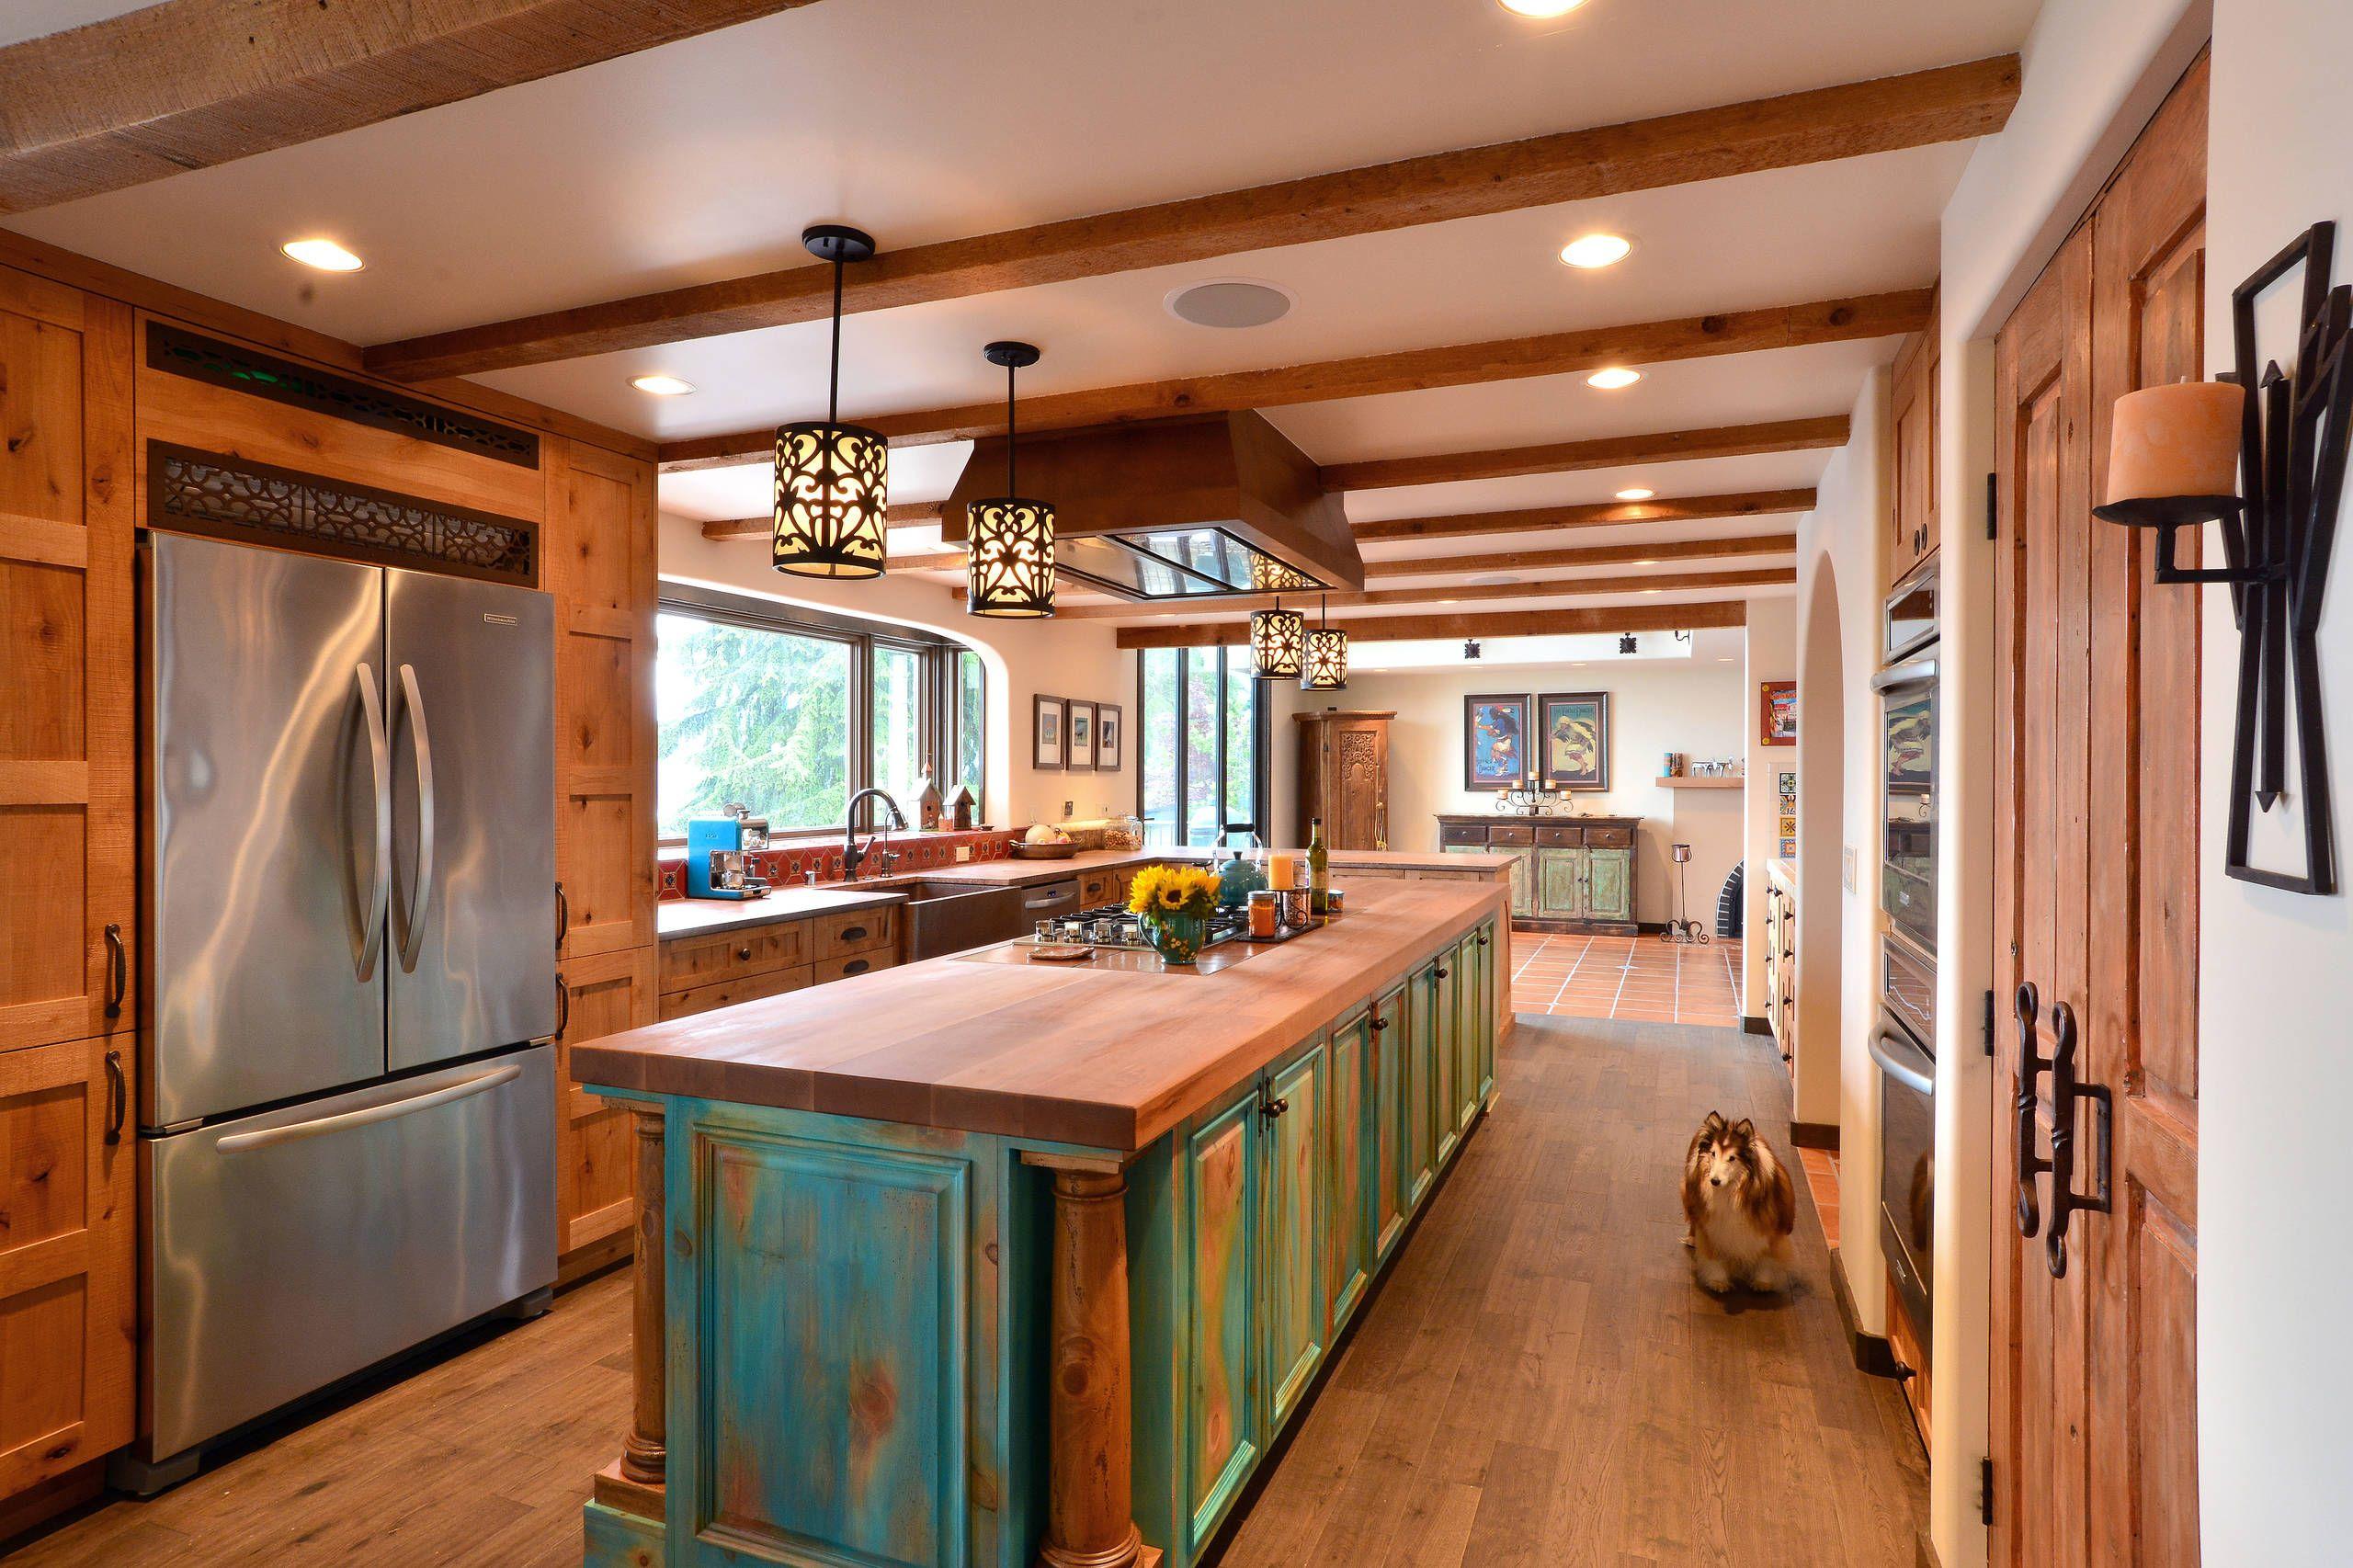 27 southwest kitchen designs and ideas southwest kitchen on extraordinary kitchen remodel ideas id=57742